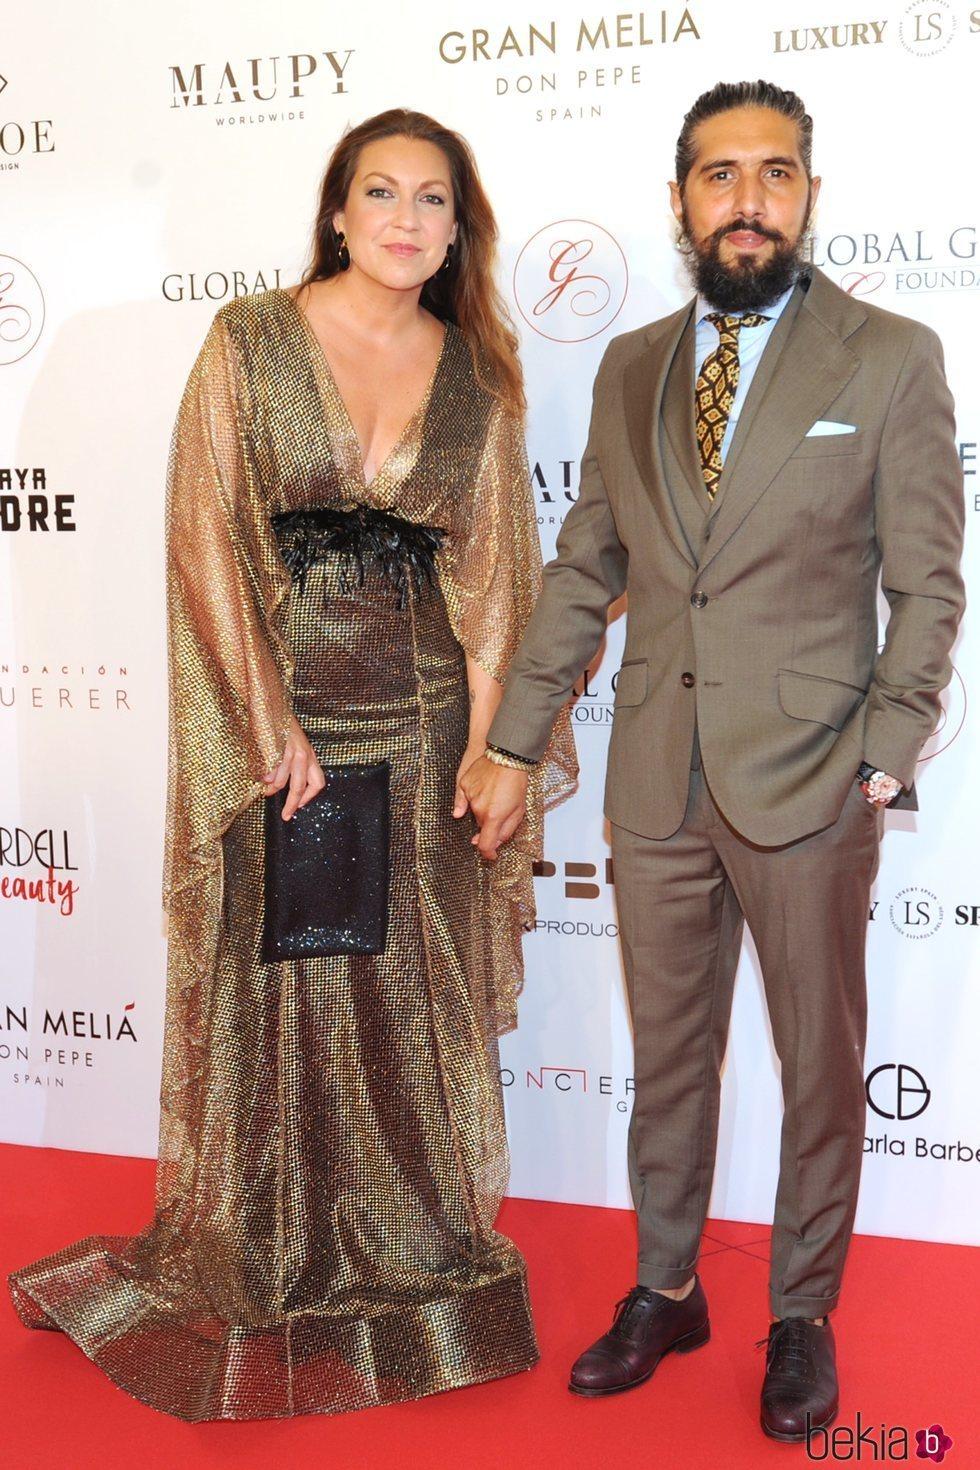 La cantante española Niña Pastori y 'Chaboli' en la gala Global Gift Marbella 2018